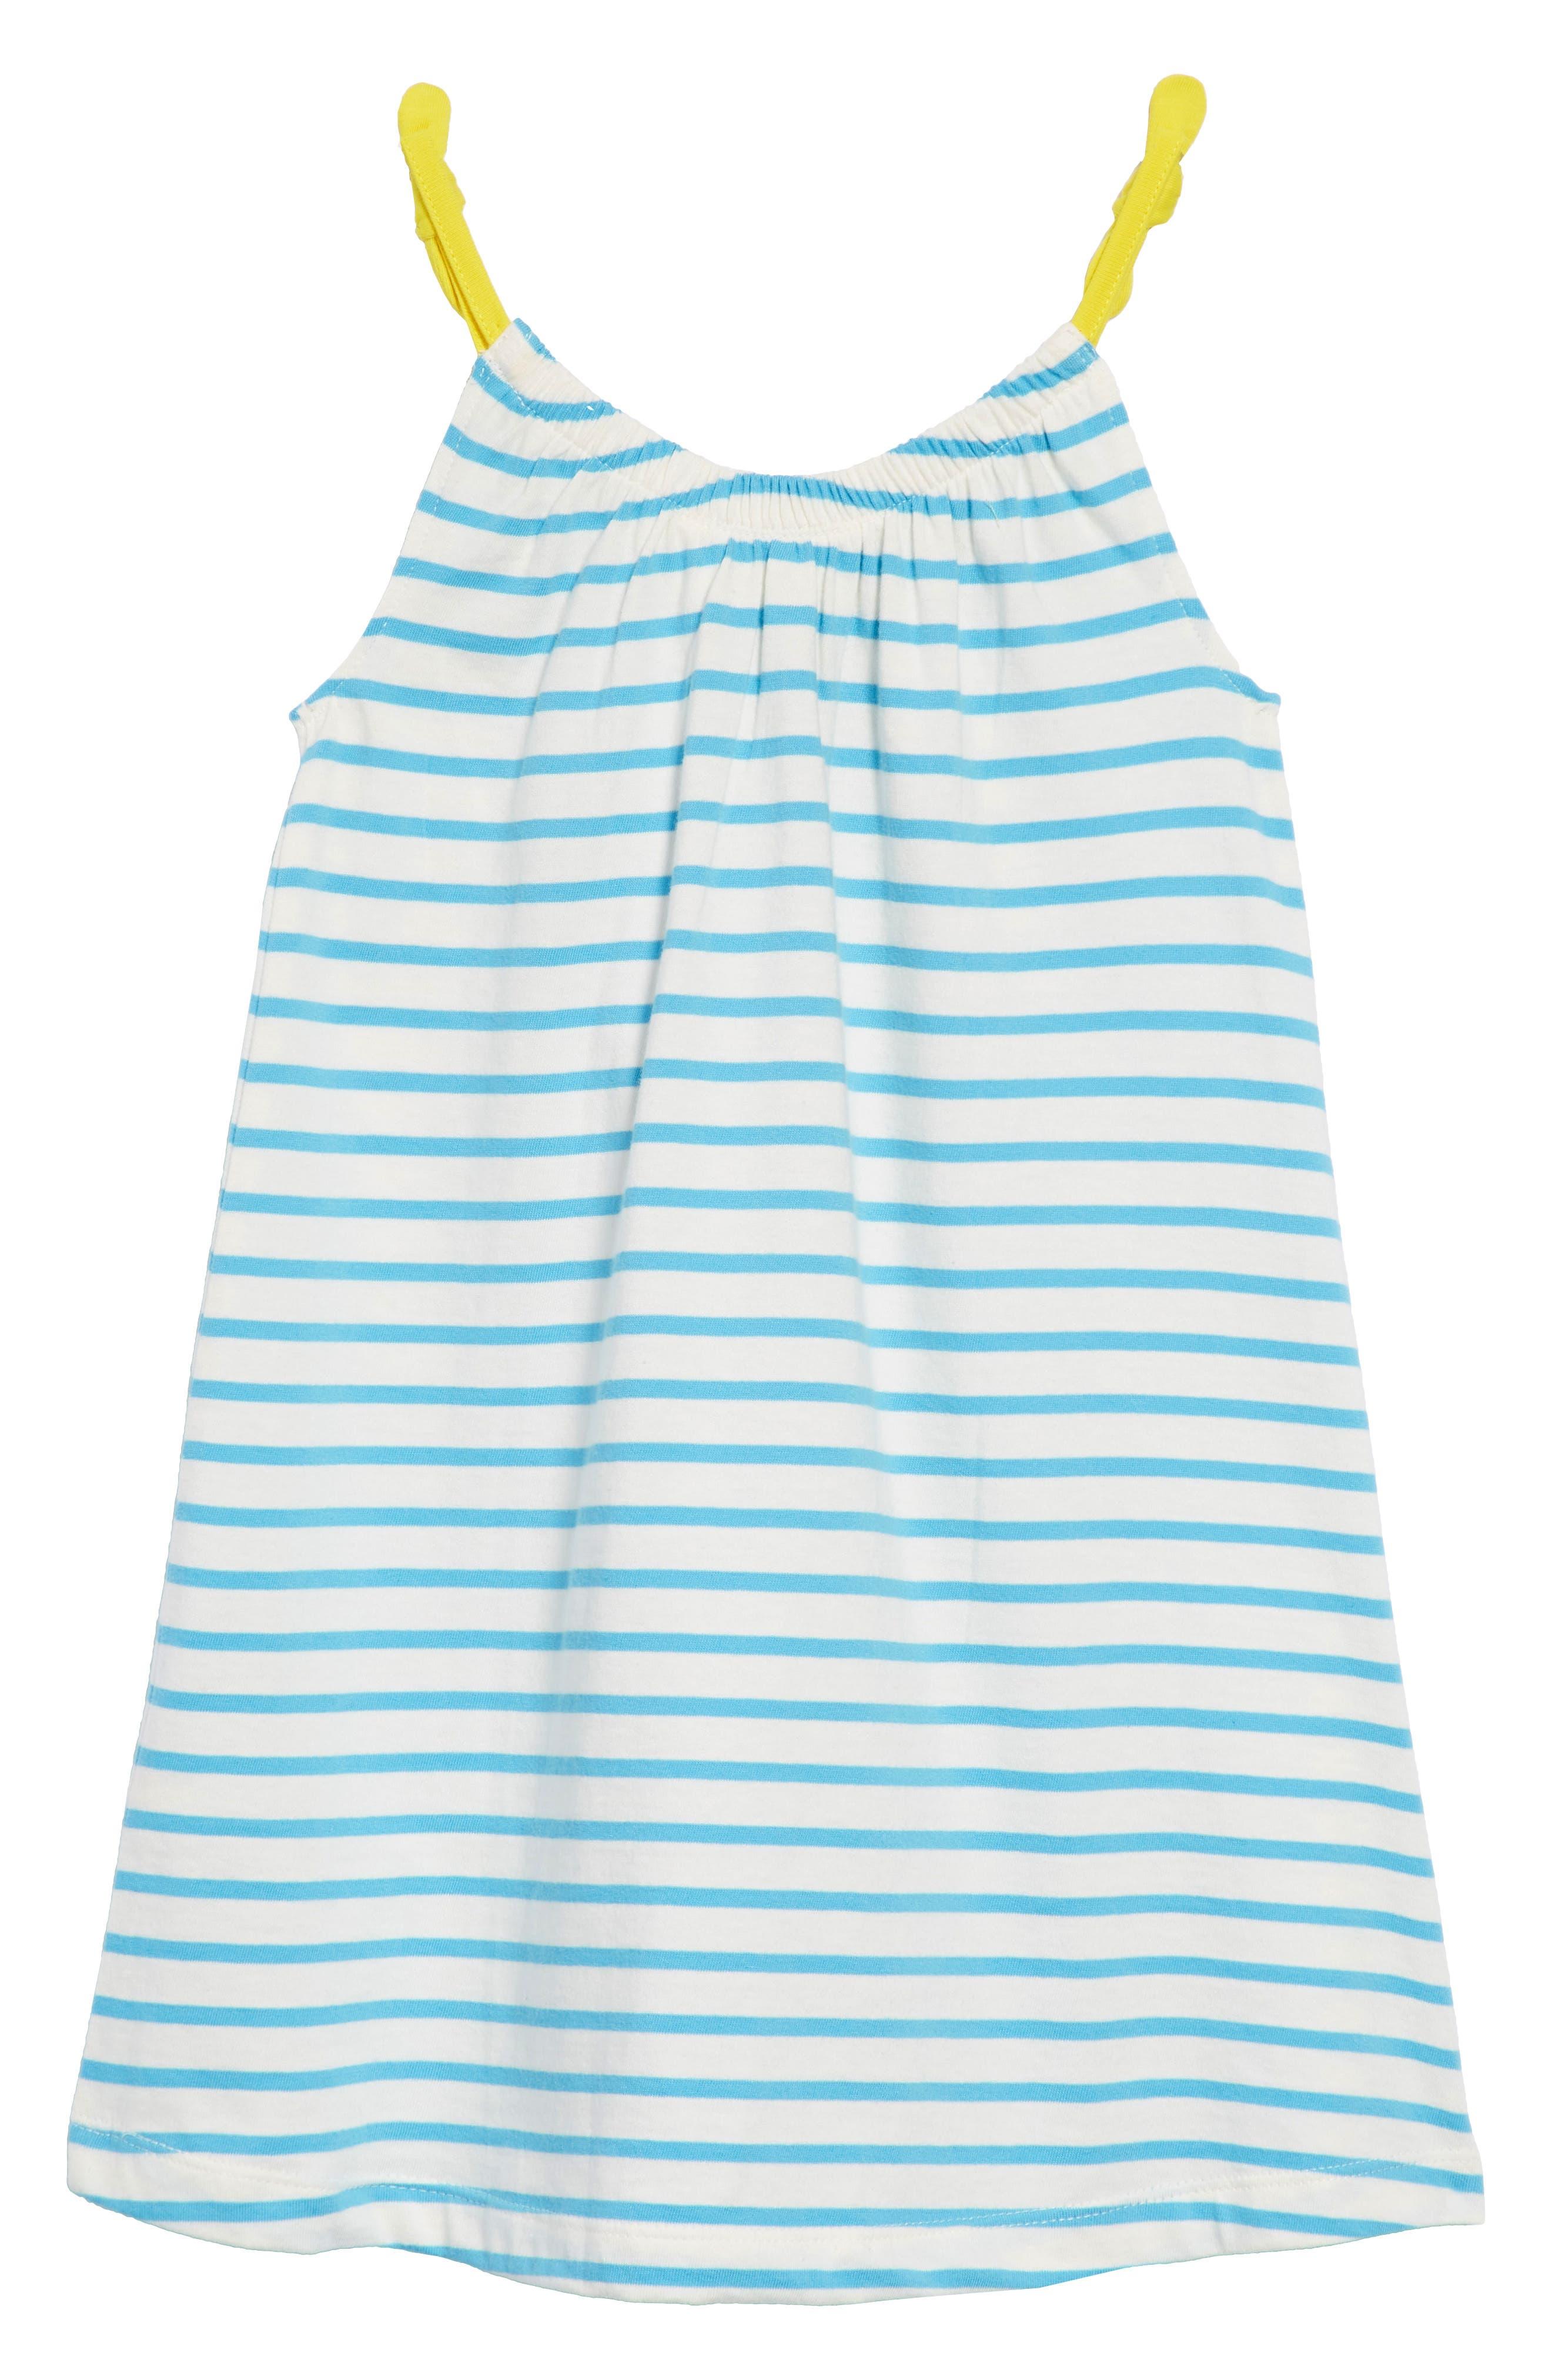 Jersey Sequin Sundress,                             Alternate thumbnail 2, color,                             Ivory/ Penzance Blue Nav